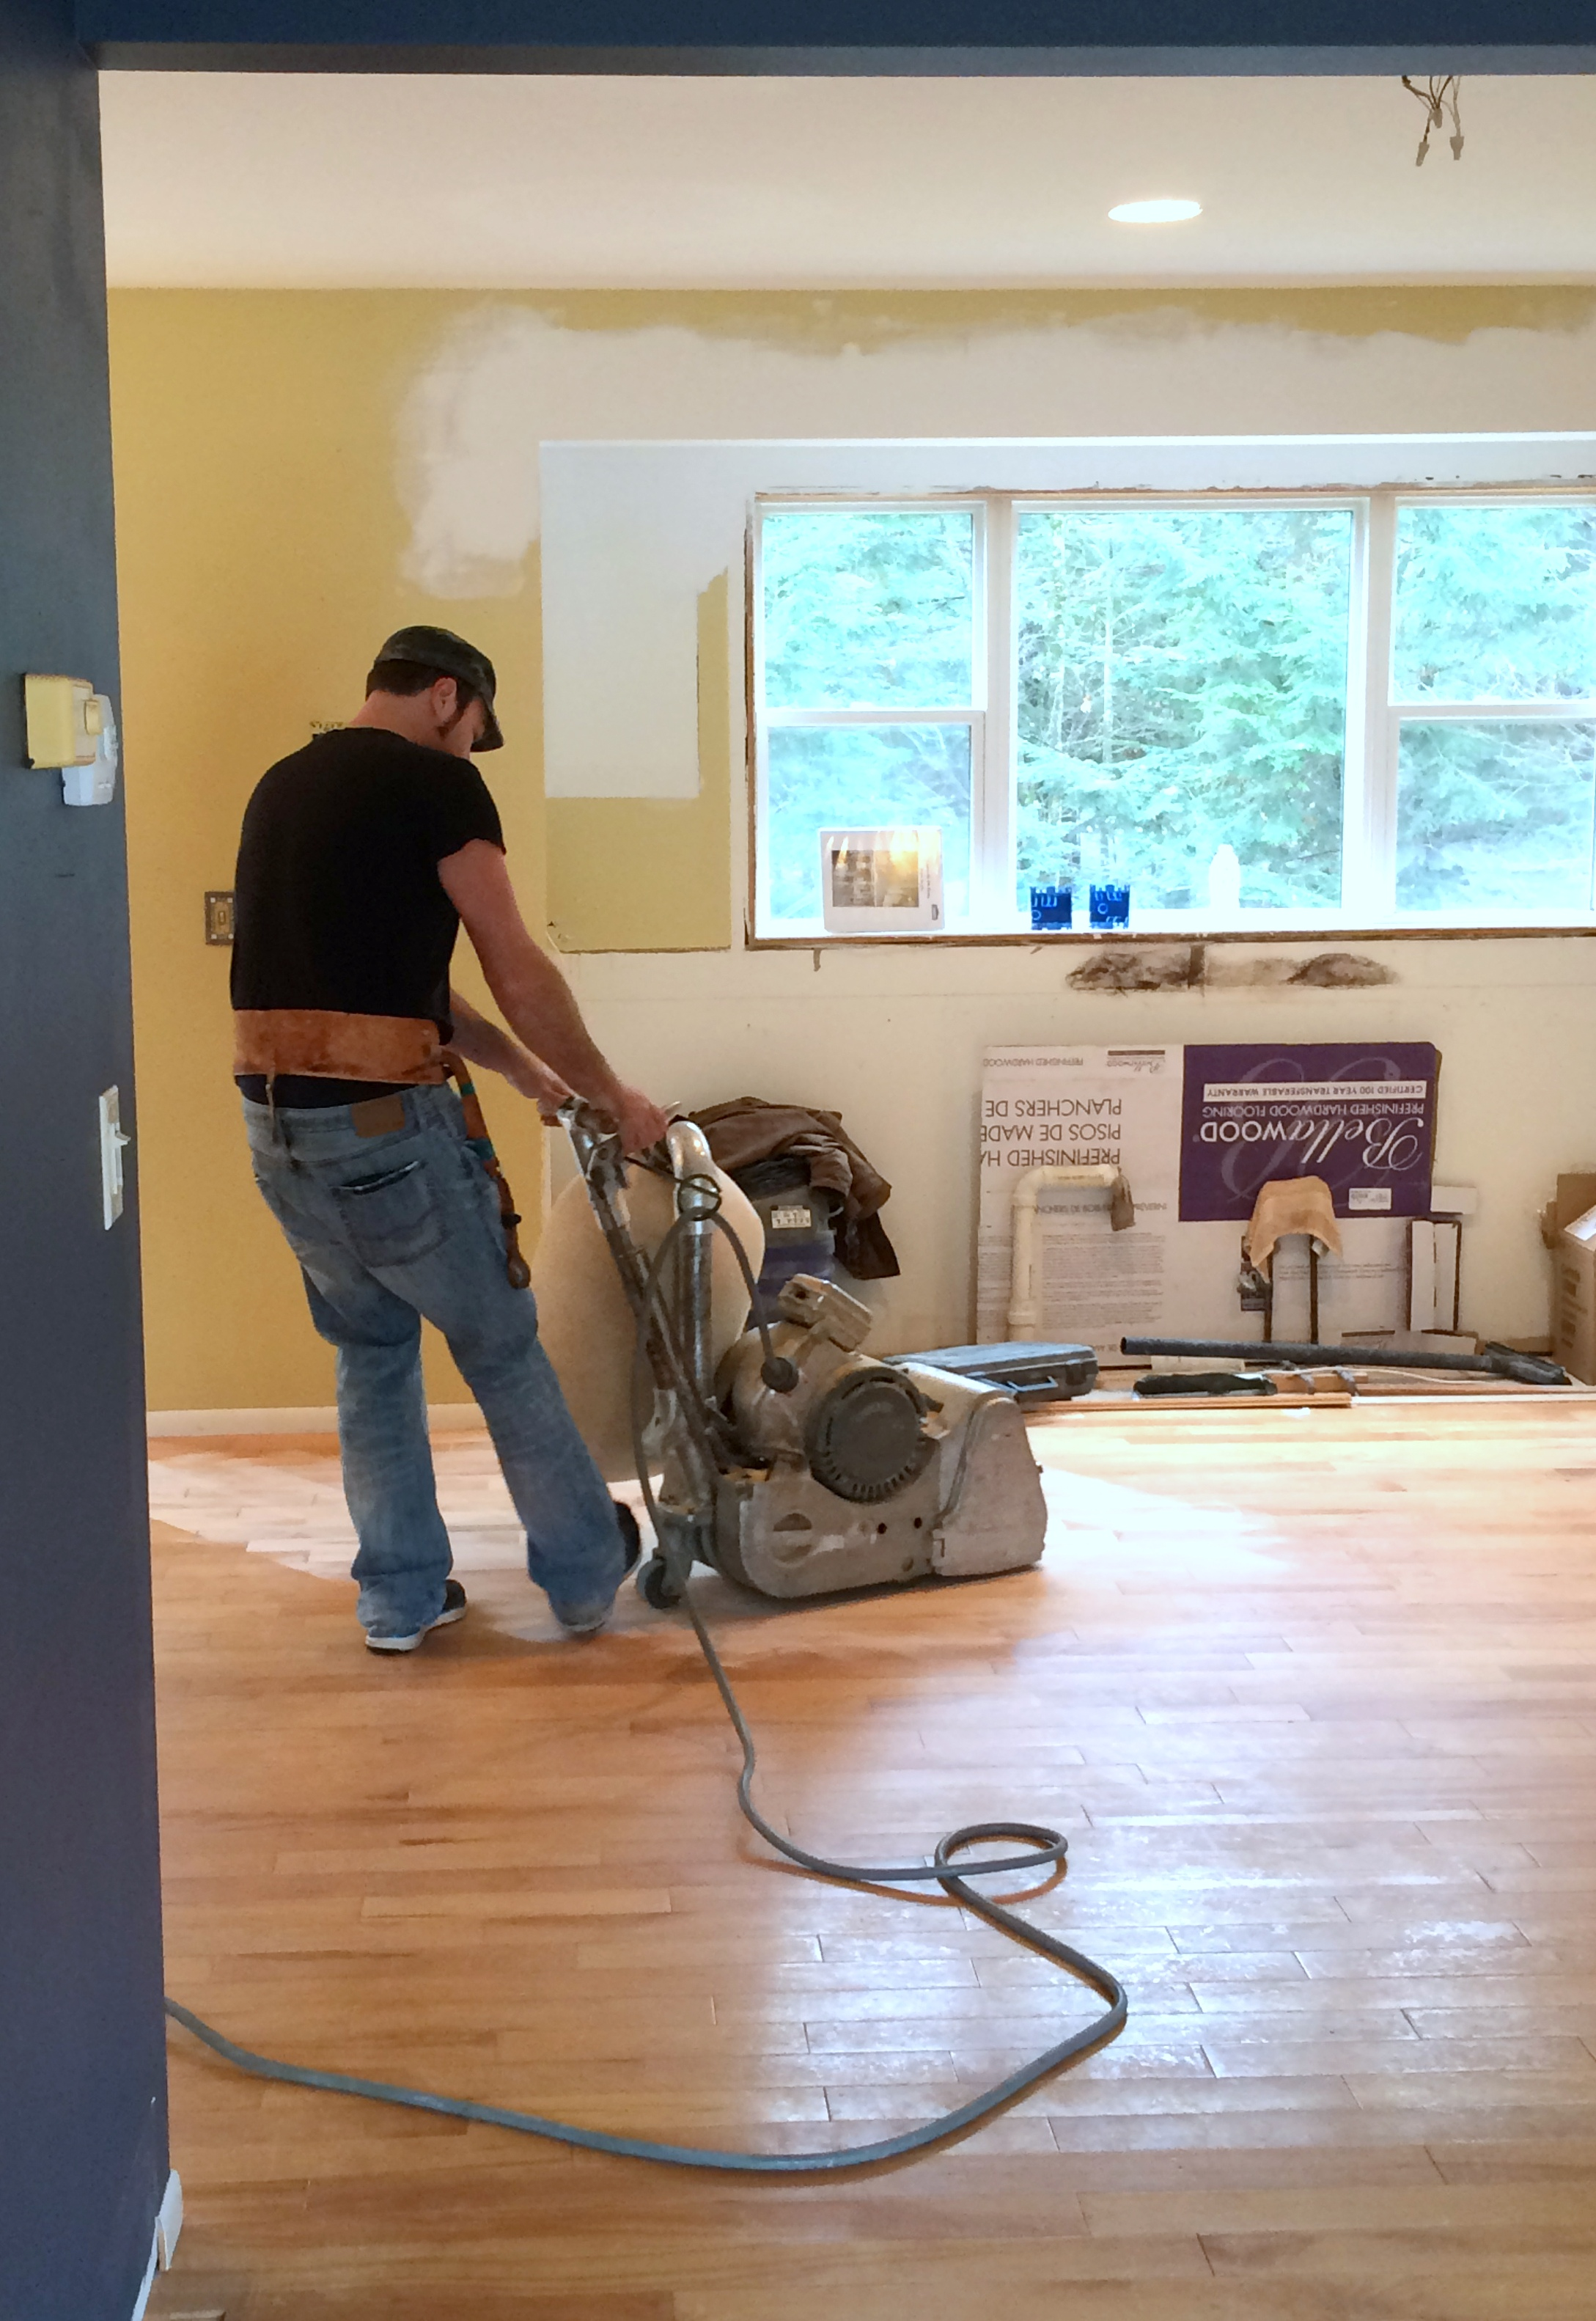 kitchen progress staining hardwood floors wood floor in kitchen Kitchen Renovation Patch Repair and Stain the Hardwood Floors